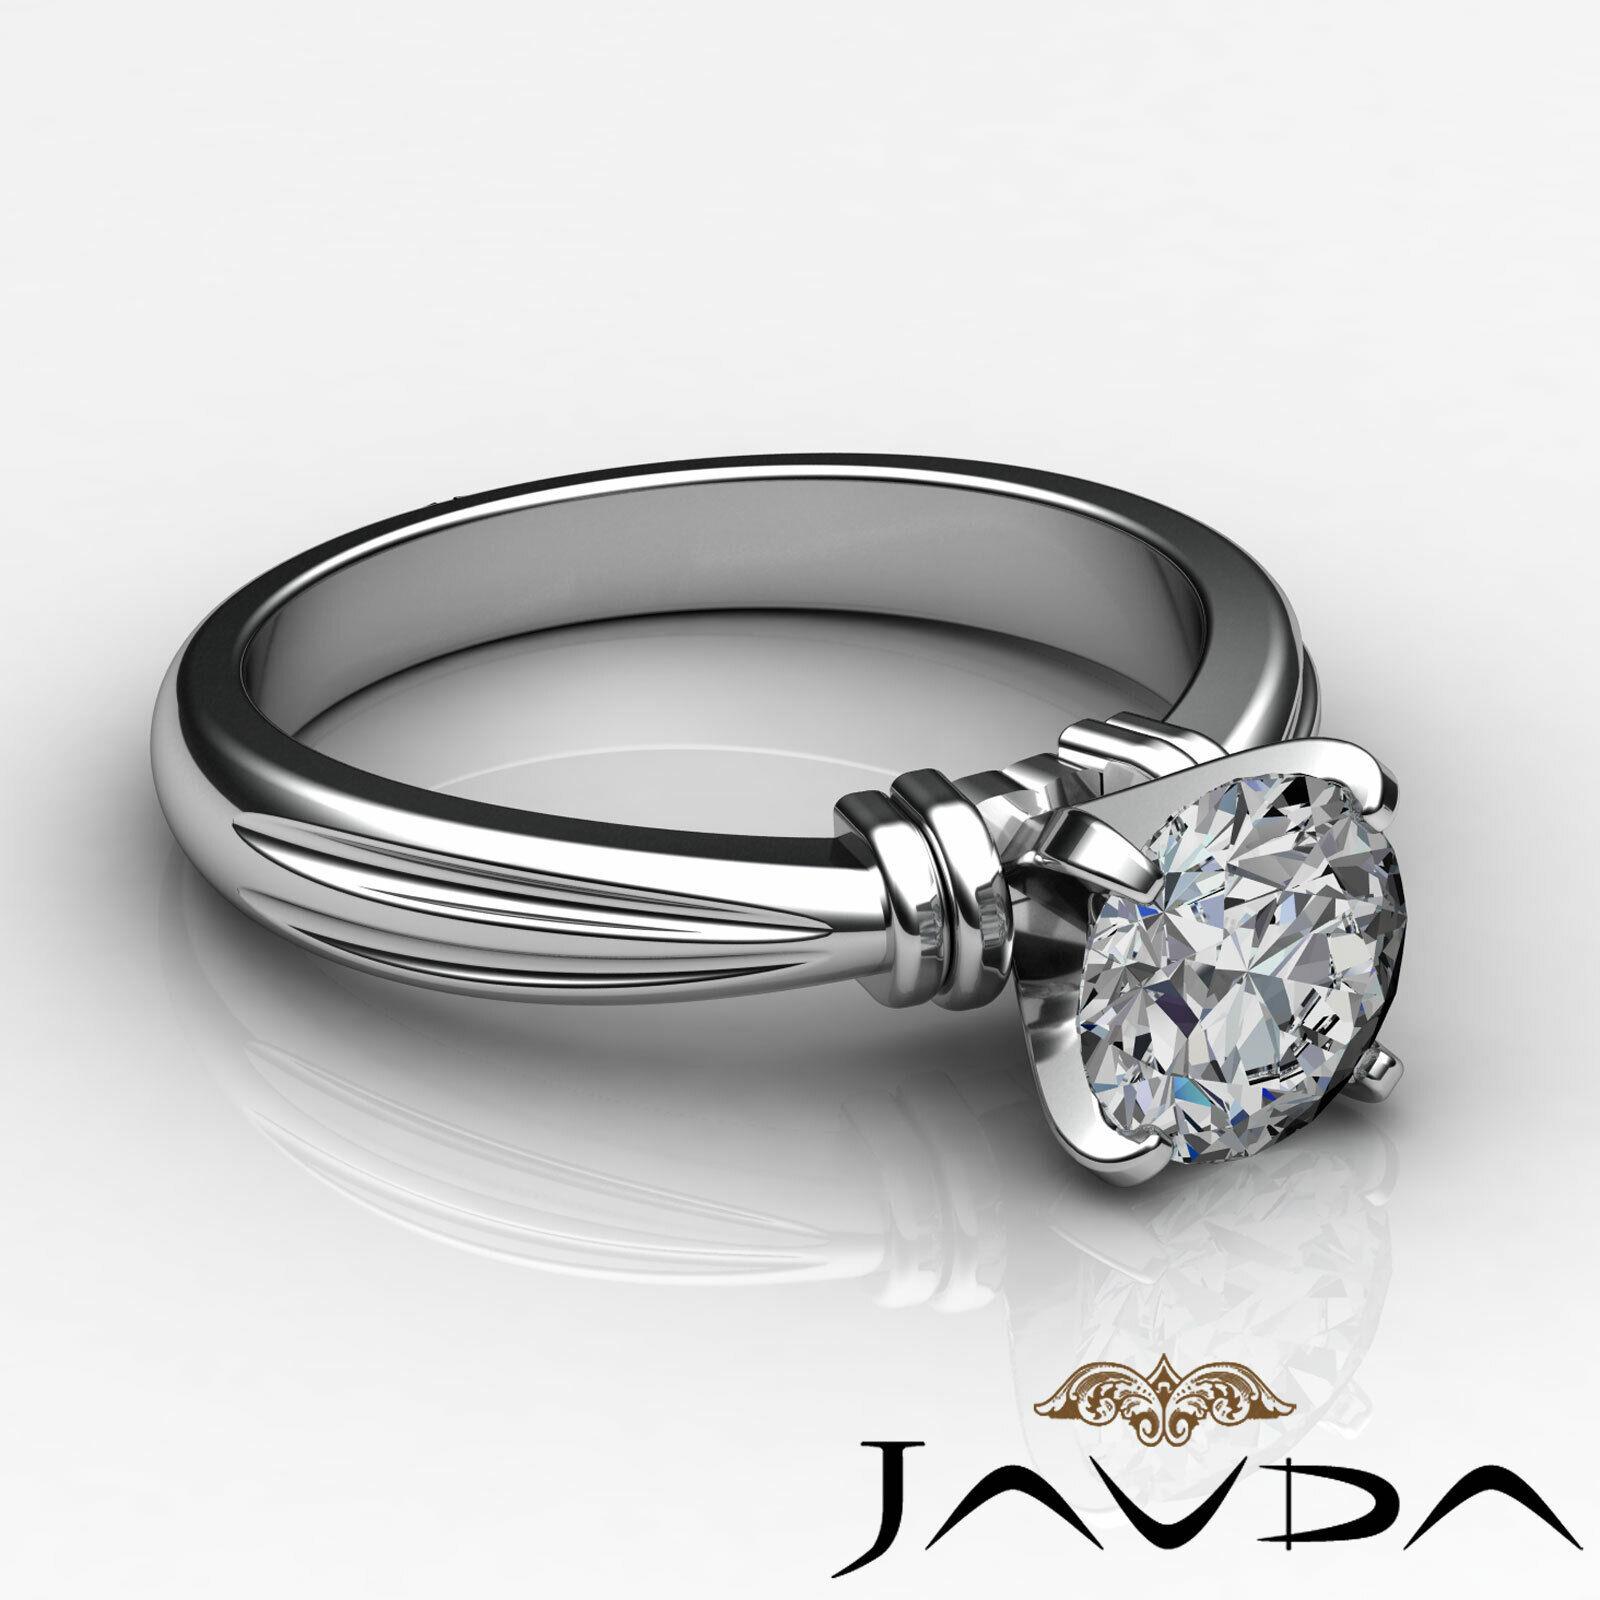 Round Solitaire Natural GIA H Color VVS2 Diamond Women's Engagement Ring 1 ctw. 4